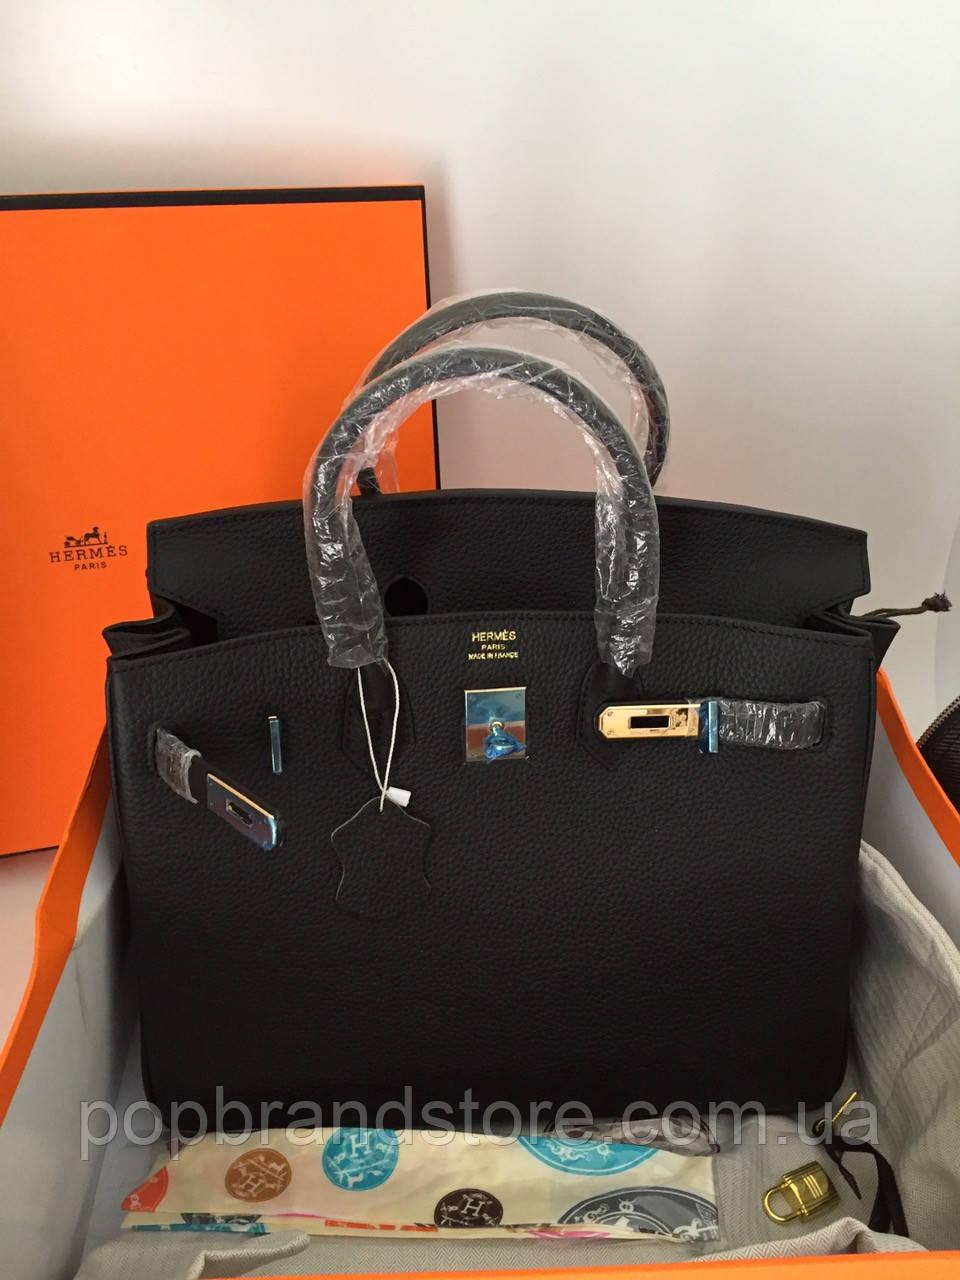 c41a2cfab867 Женская сумка Hermes Birkin 35 см натуральная кожа - Pop Brand Store |  брендовые сумки,